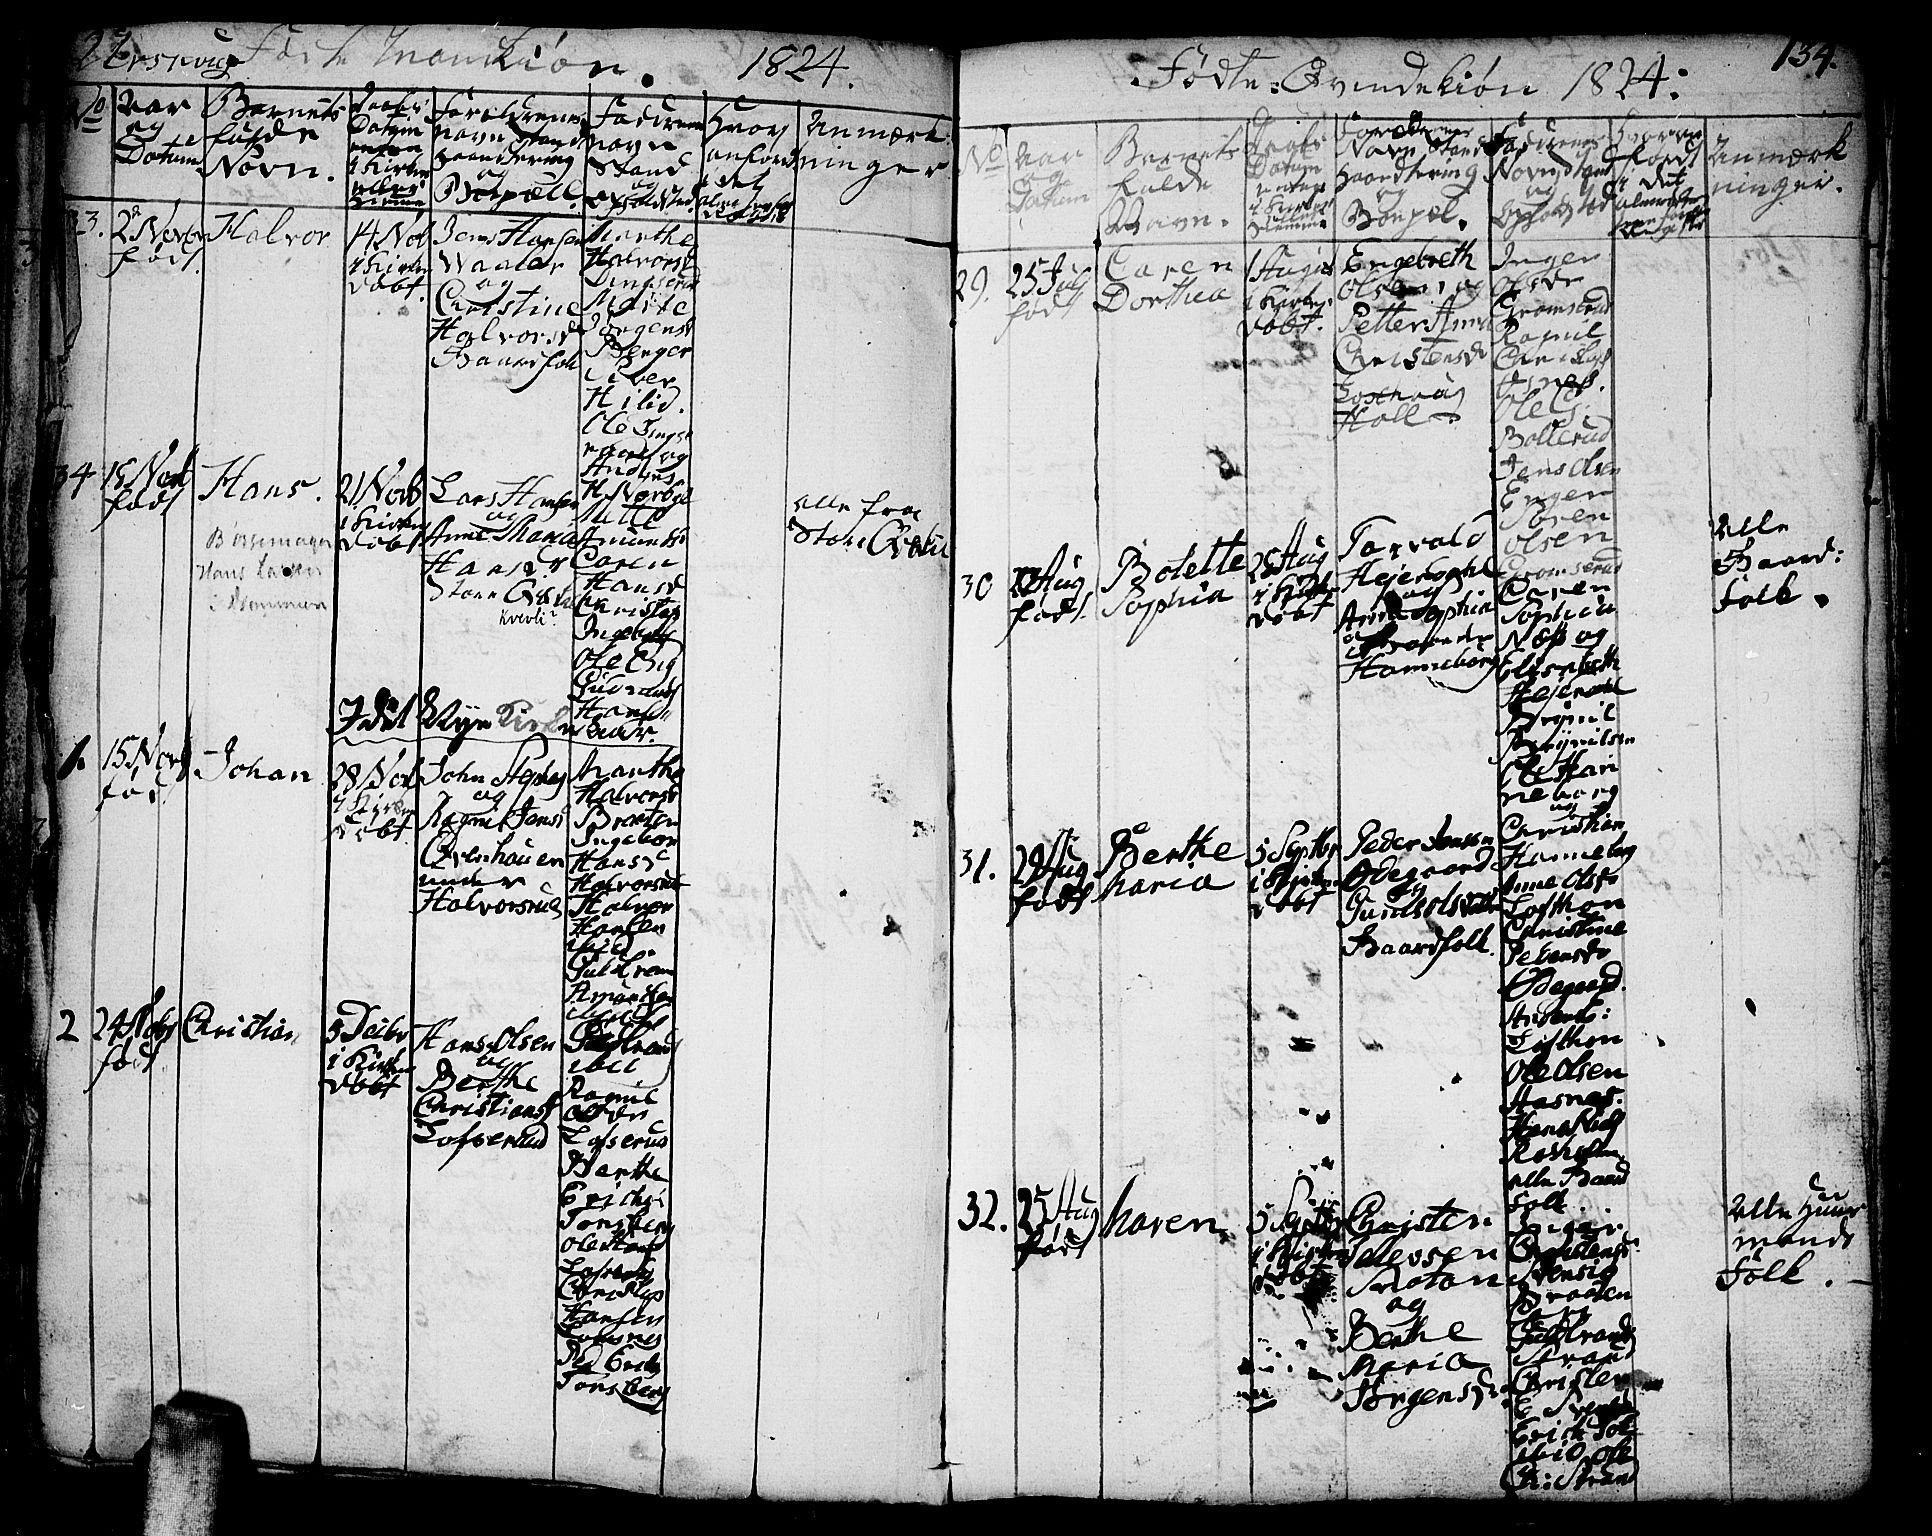 SAO, Aurskog prestekontor Kirkebøker, F/Fa/L0005: Ministerialbok nr. I 5, 1814-1829, s. 134